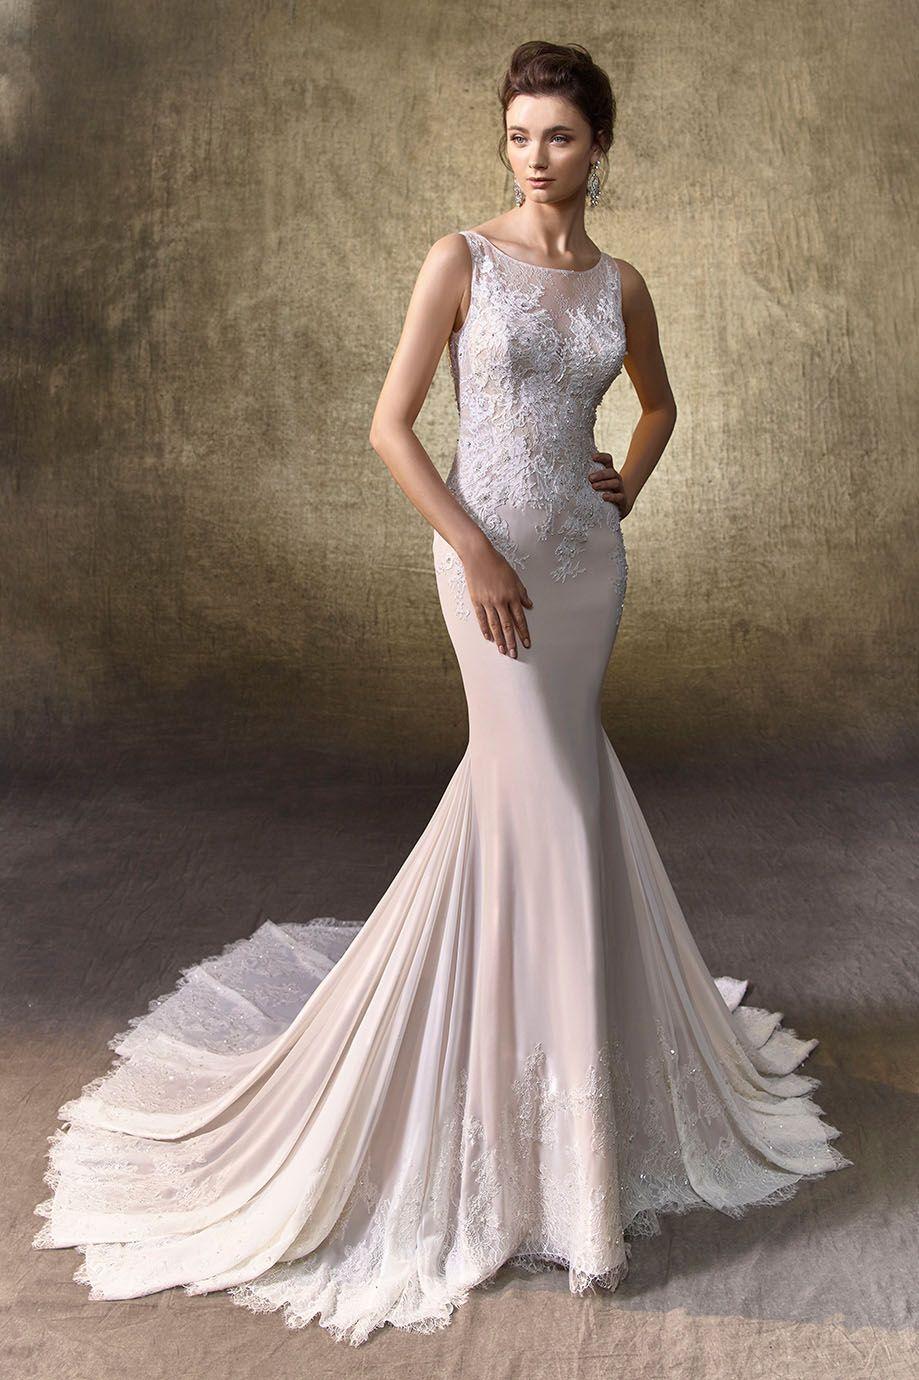 Wedding dresses in leeds designer gowns from scarlet poppy wedding